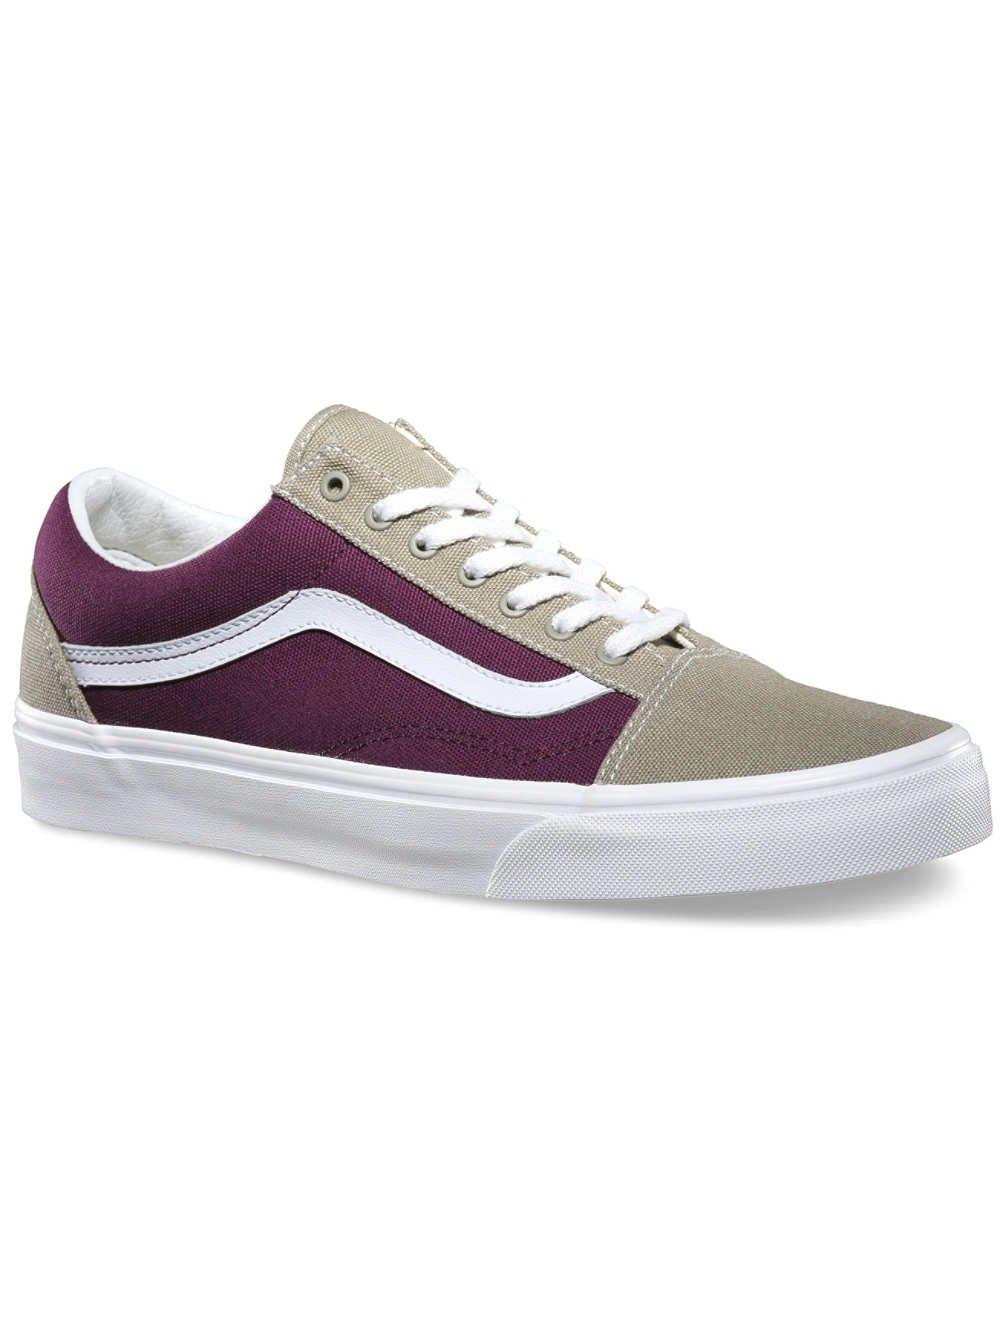 Vans Grau/Weiß Herren Sneaker Violett - Purple/Khaki Grau/Weiß Vans e07180